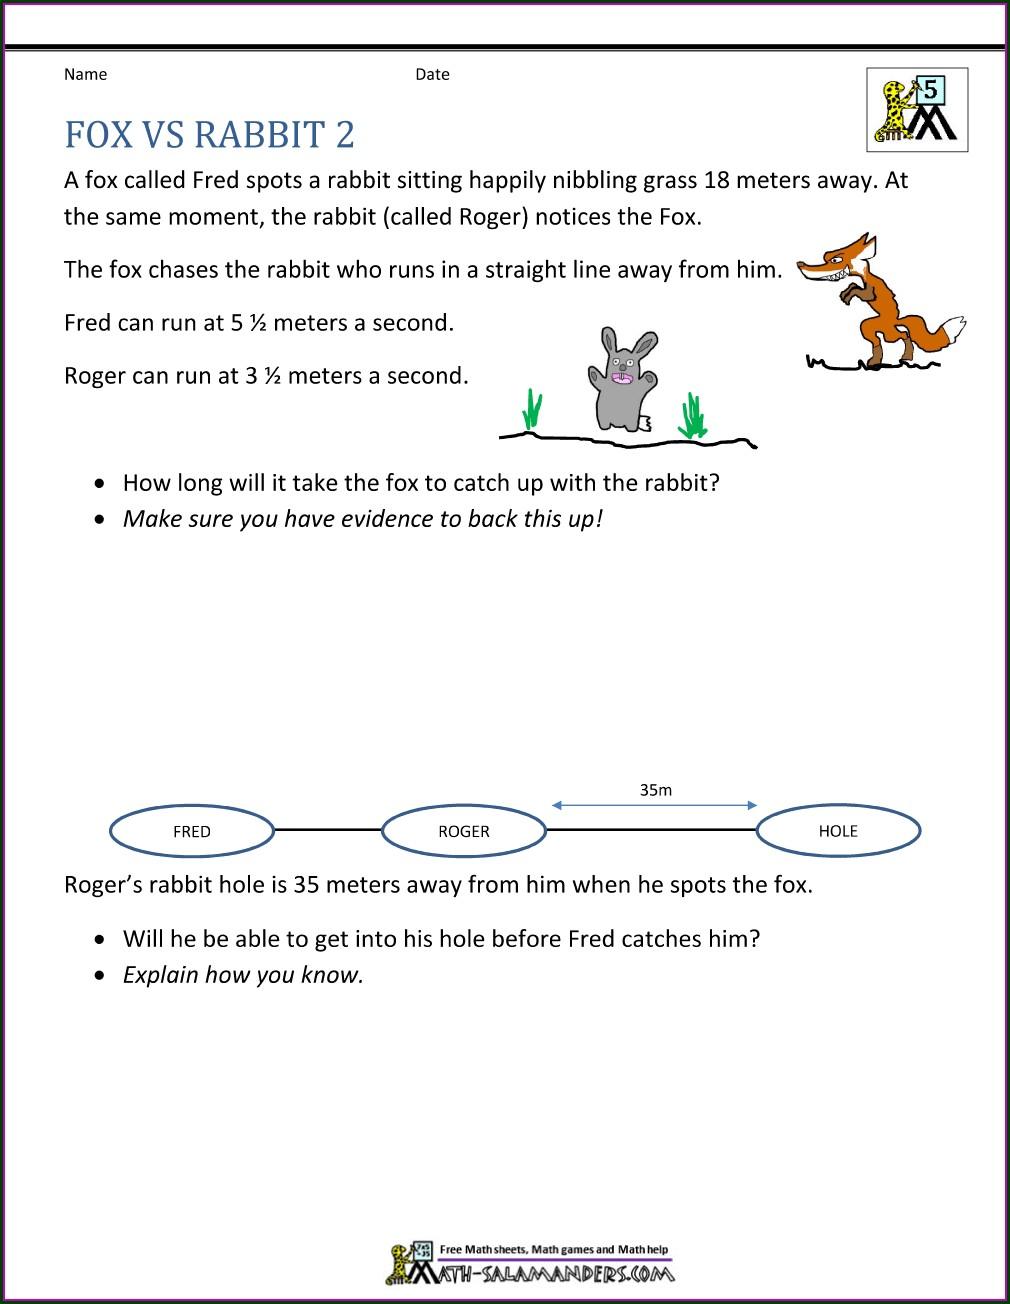 5th Grader Grade 5 Math Word Problems Worksheet